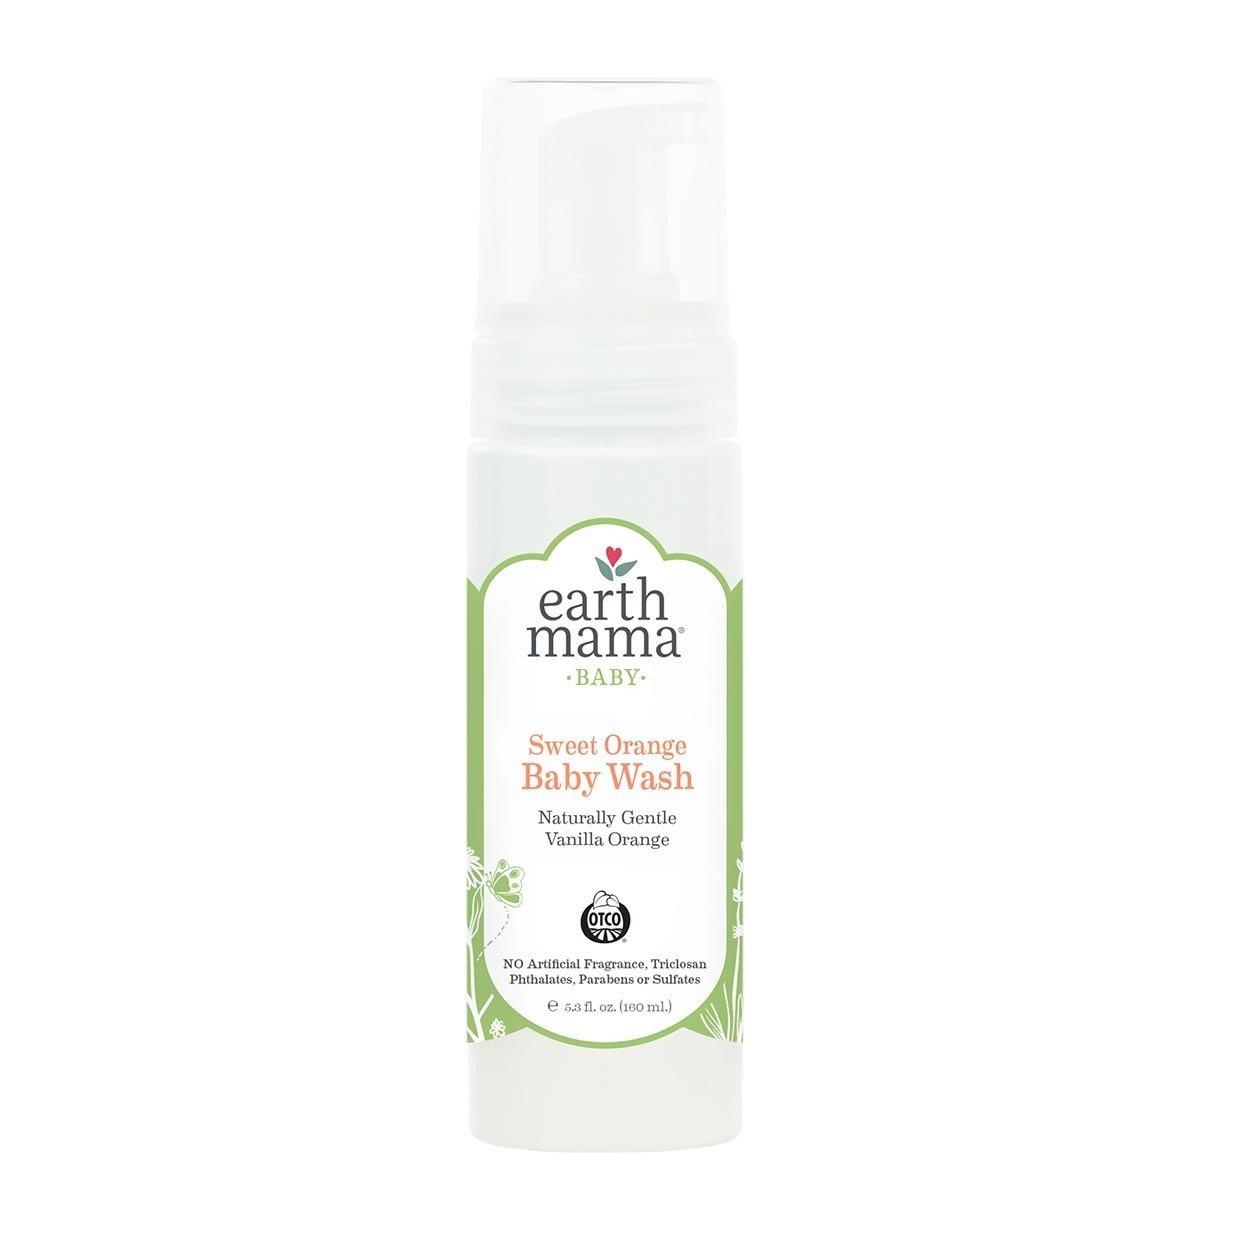 Earth Mama Angel Baby Organic Angel Baby Shampoo & Body Wash, 5.3-Ounce Bottles (Pack of 3)